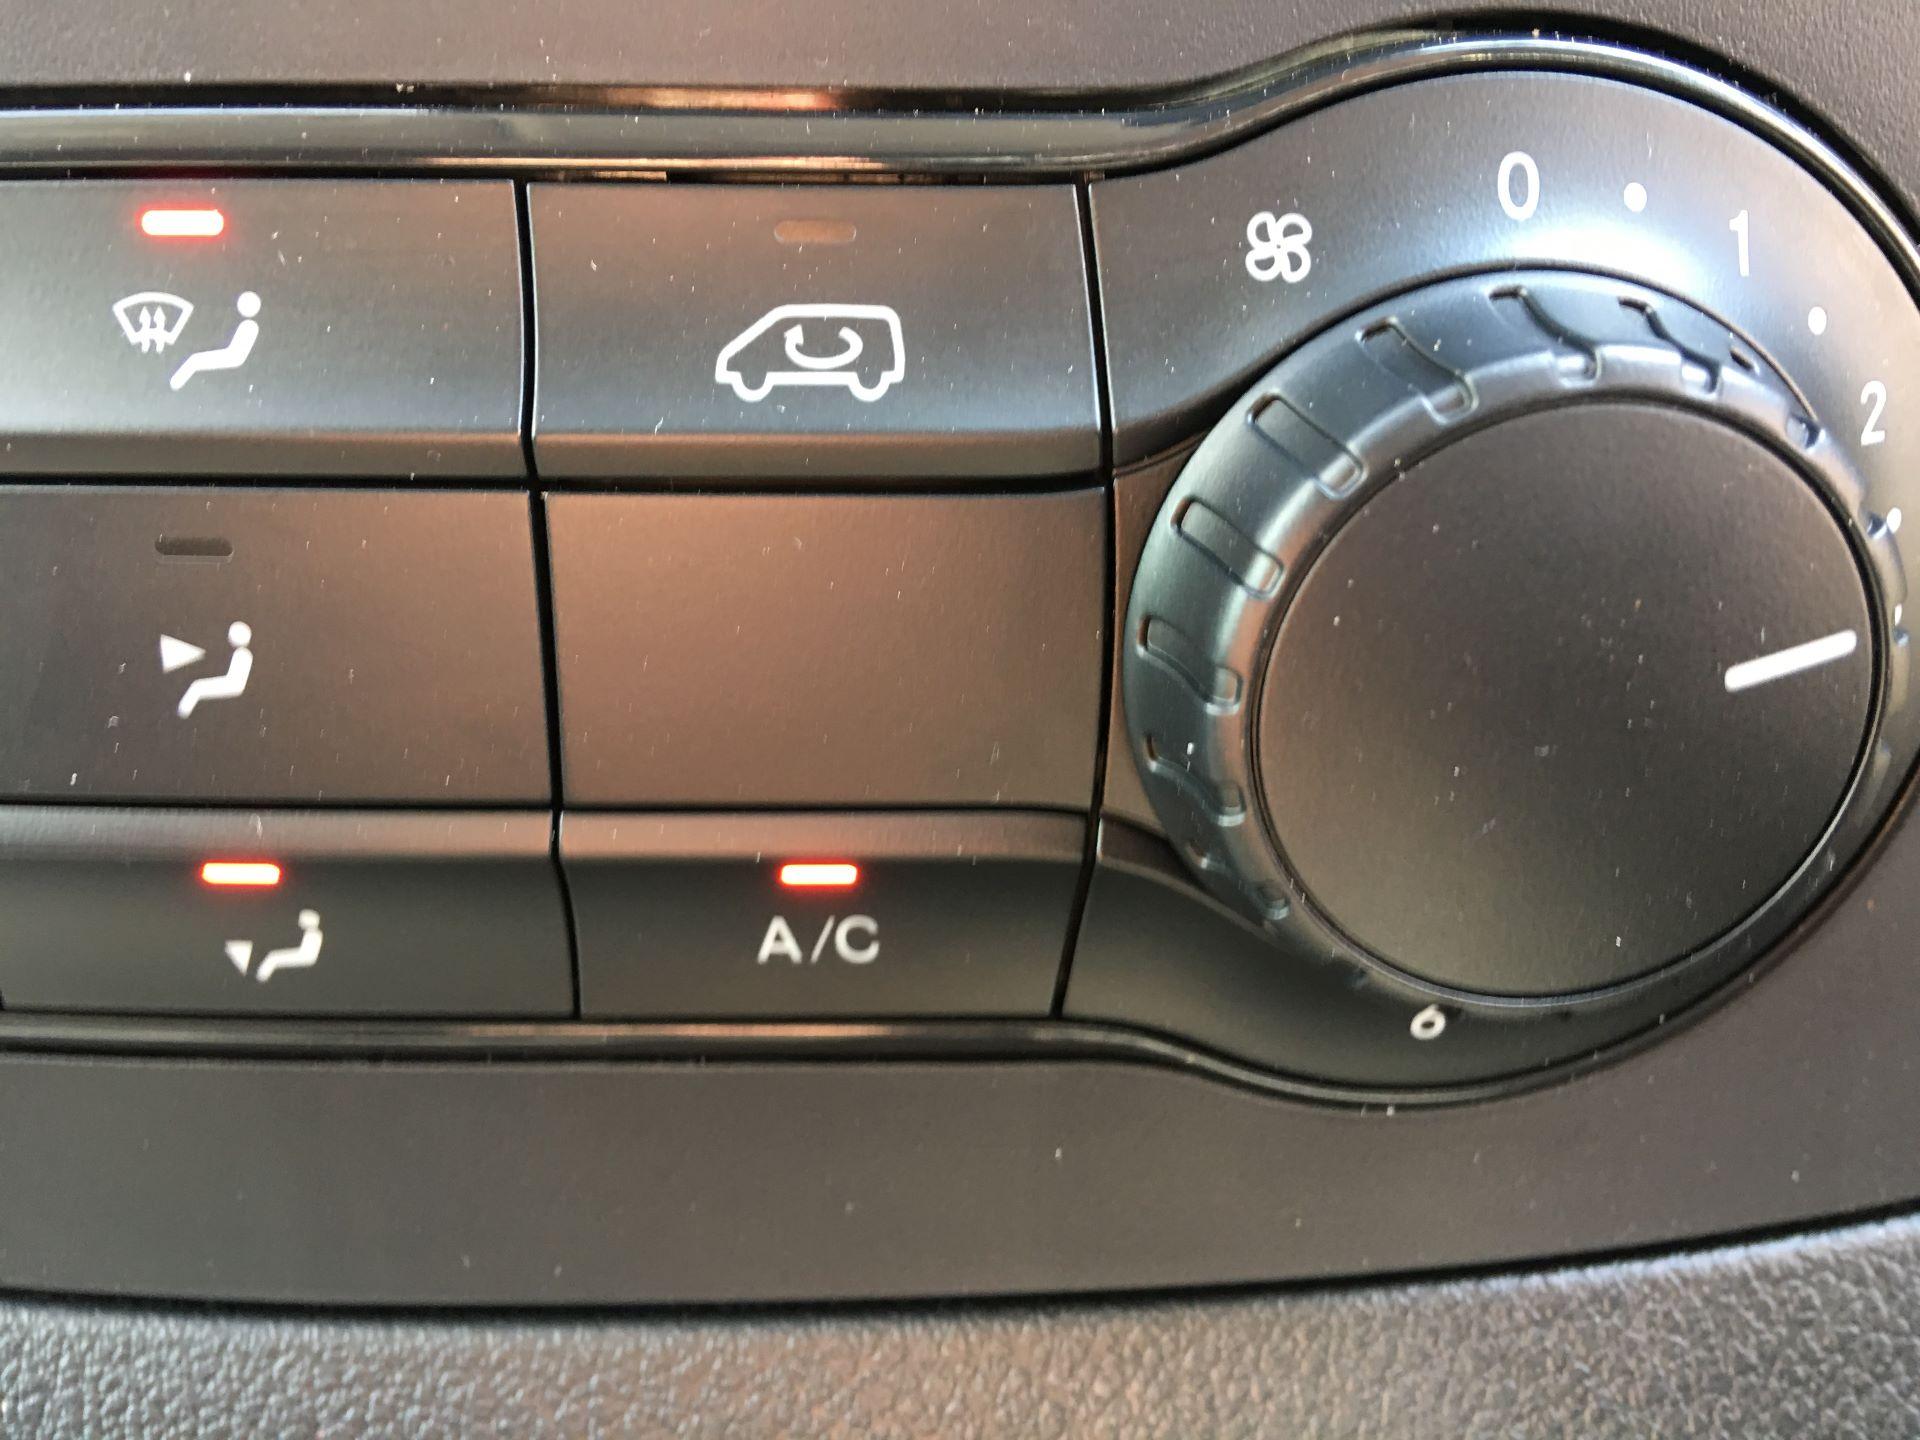 2019 Mercedes-Benz Vito LONG 111 CDI VAN EURO 5/6 (YM19HFY) Image 8